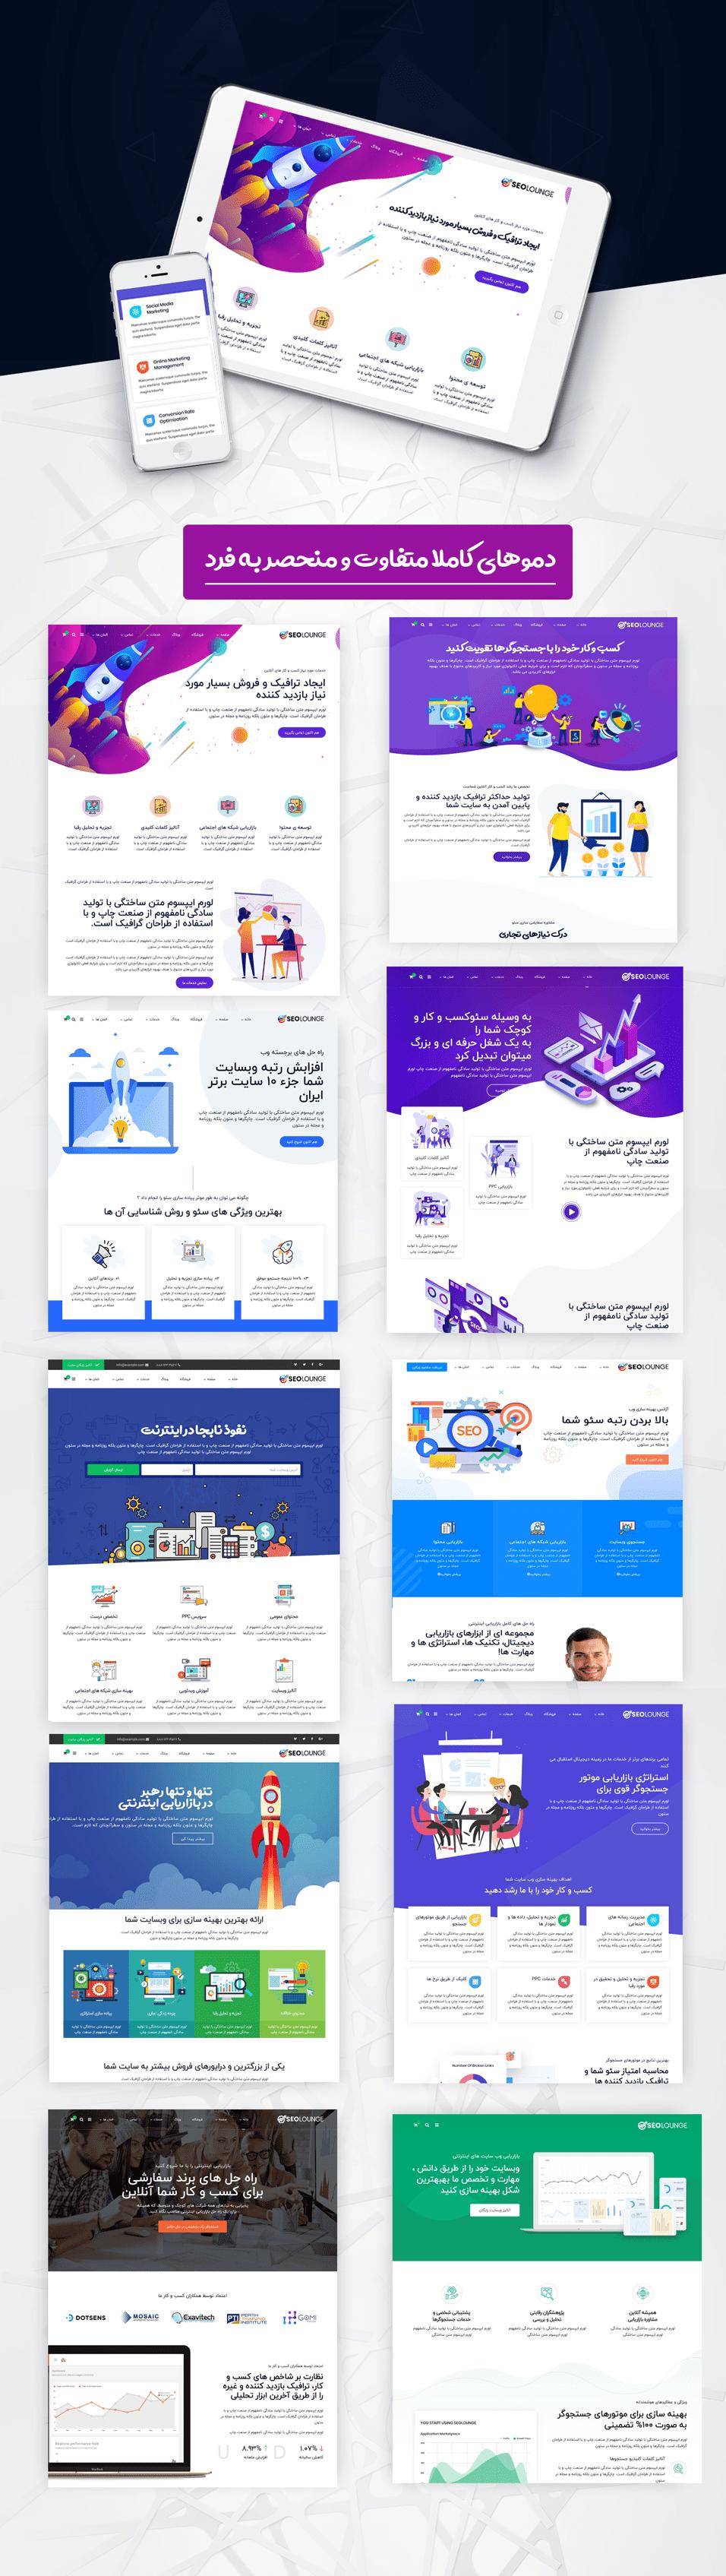 قالب Seolounge قالب دیجیتال مارکتینگ حرفه ای